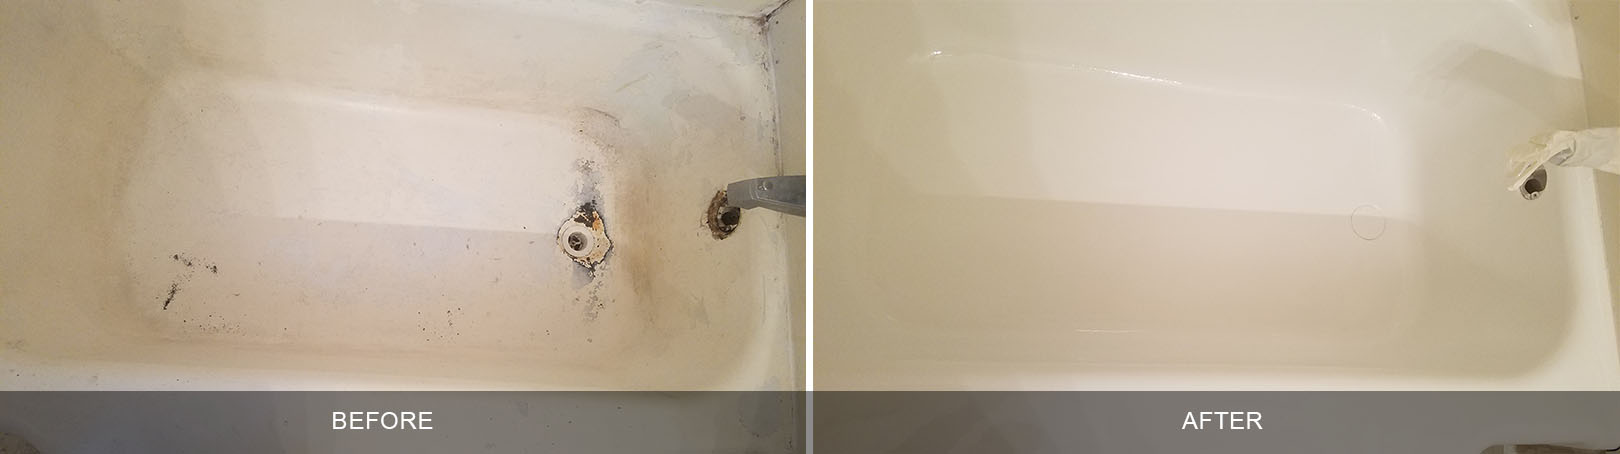 Gallery Fort Wayne Bathtub Refinishing Bathtub Resurfacing And - Bathroom remodeling fort wayne in